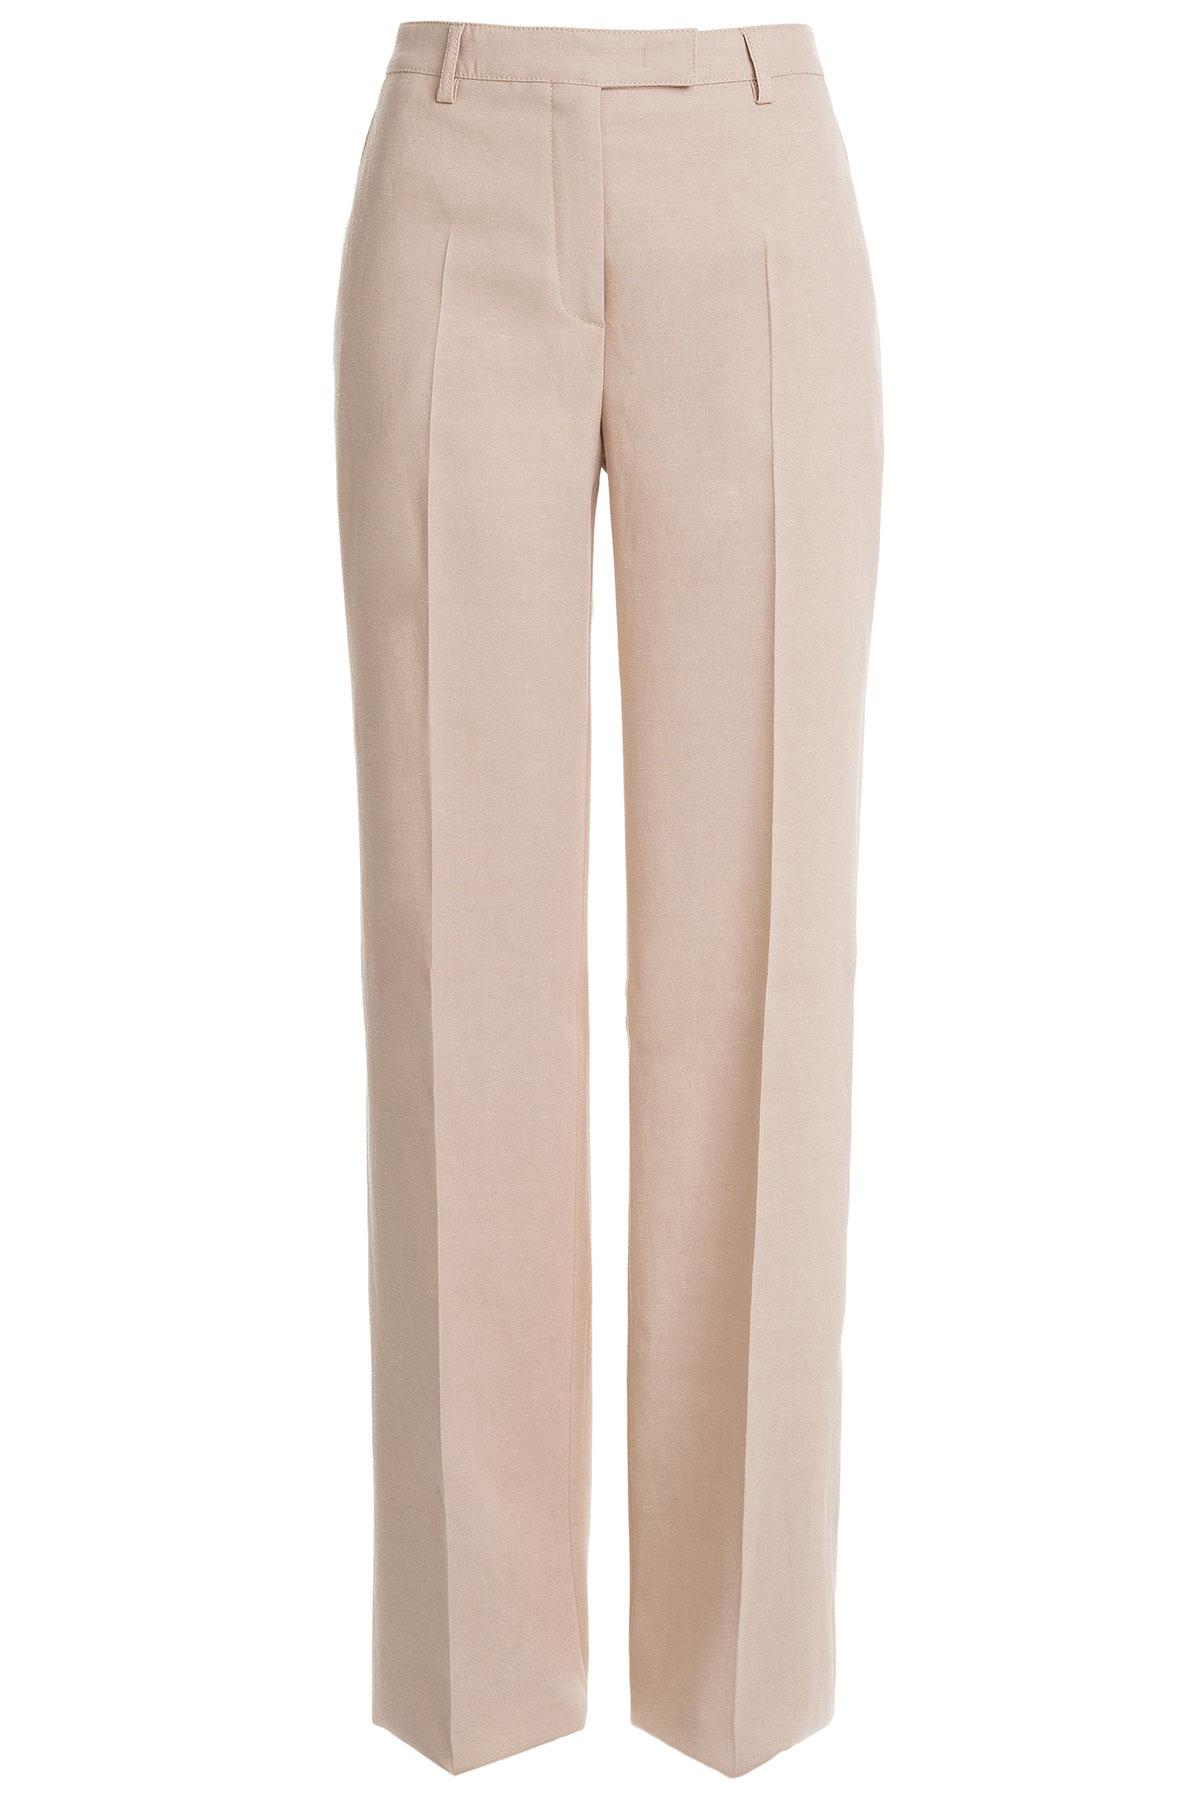 Model  ASL NEW Beige Tweed Women39s US Size 16X32 StraightLeg Dress Pants 89